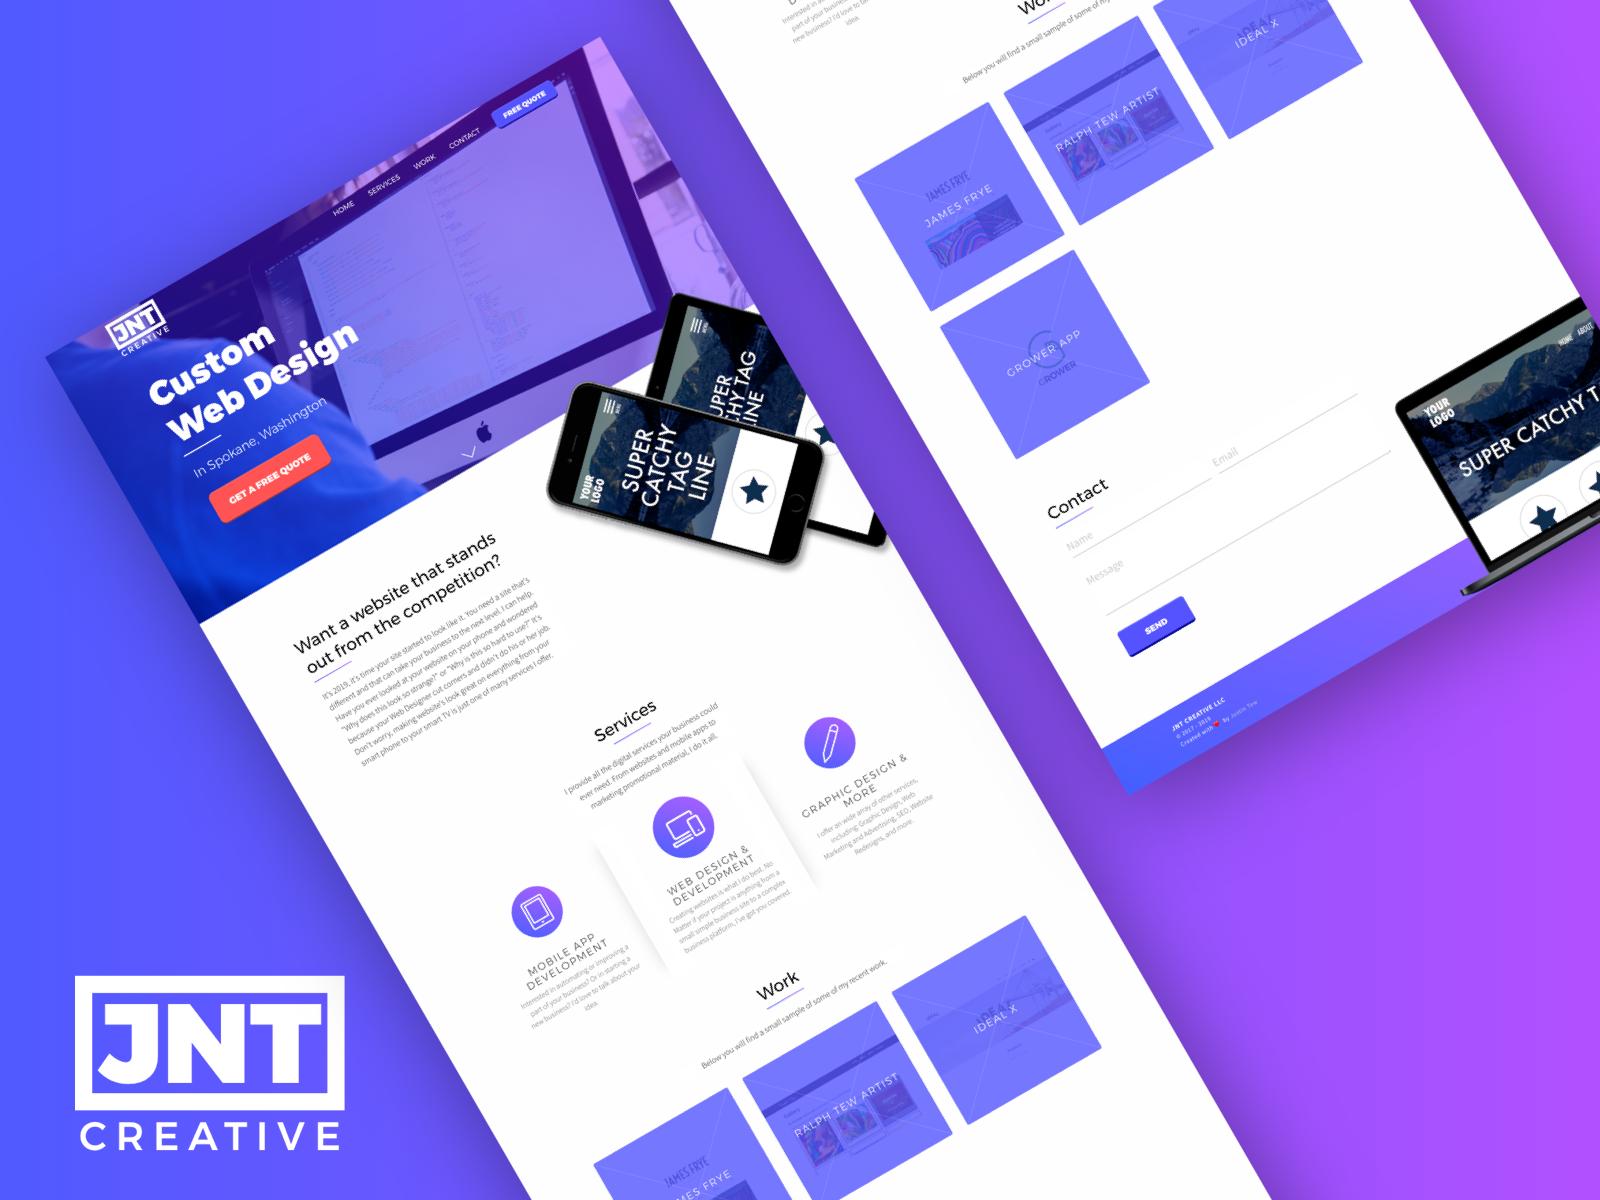 Jnt Creative Website Mockup By Justin Tew Design Inspiration